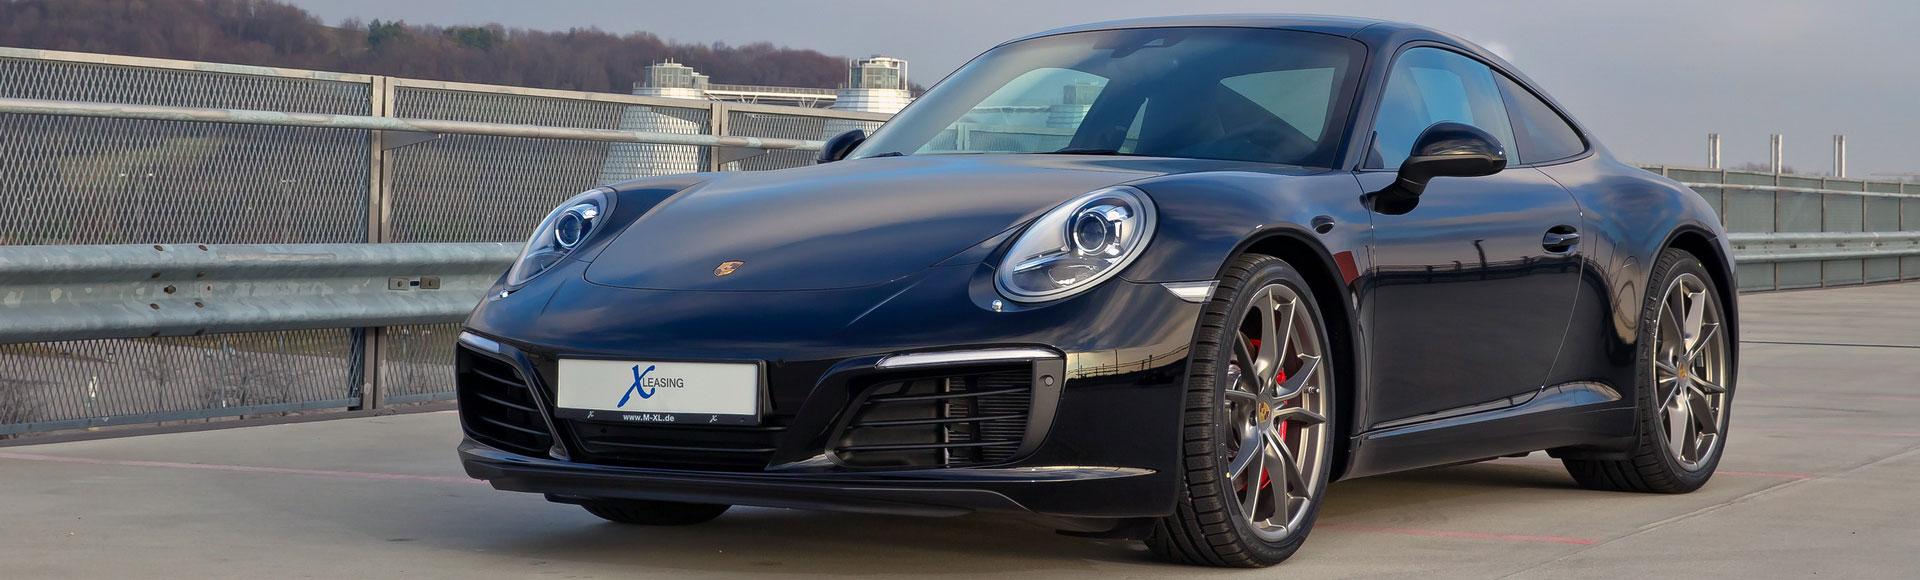 Porsche 911 991 Coupe 2016 Herbst 007